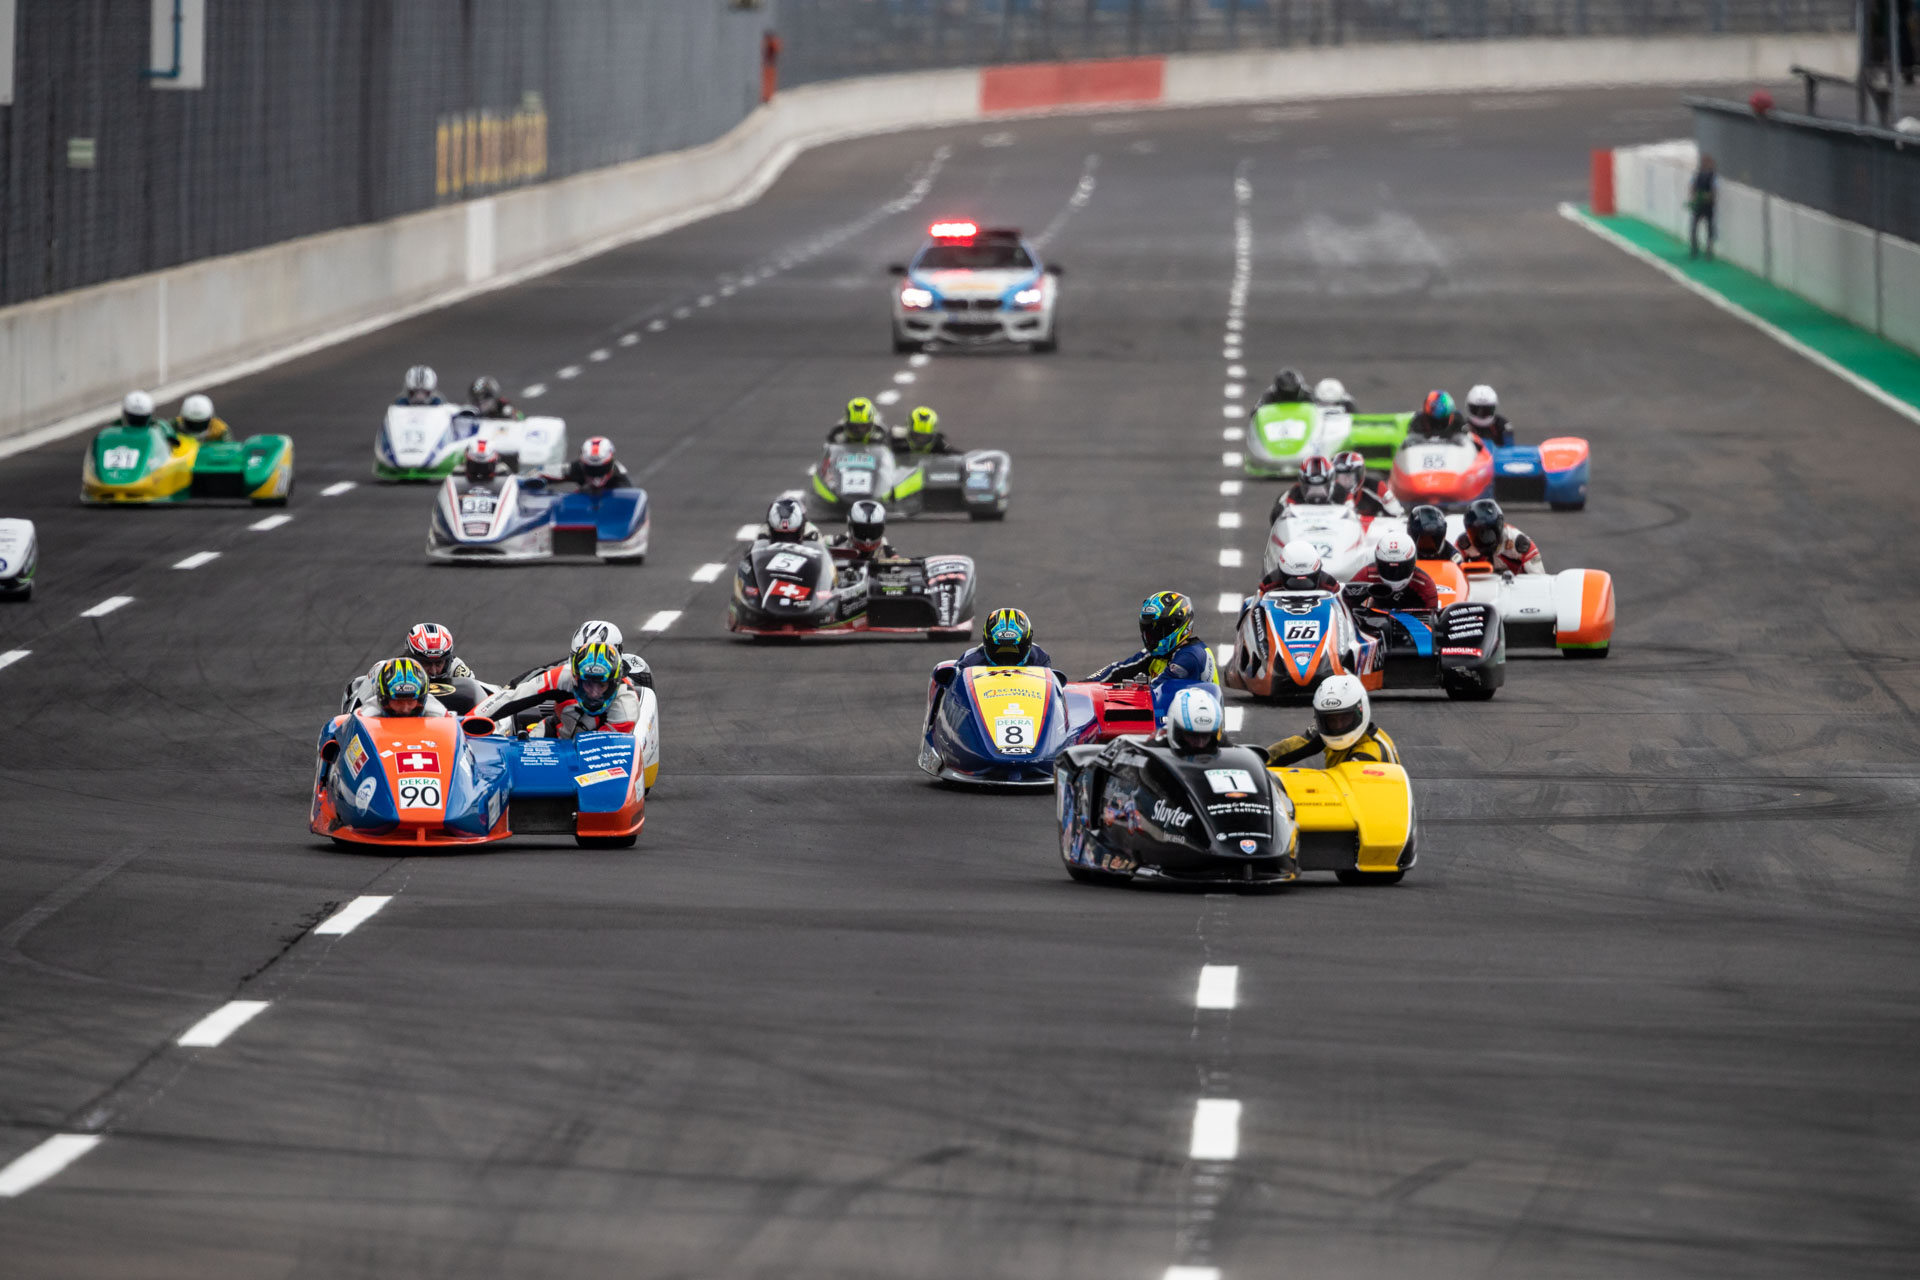 IDM_Lausitzring2018_Sidecars-Rennen1-web-2